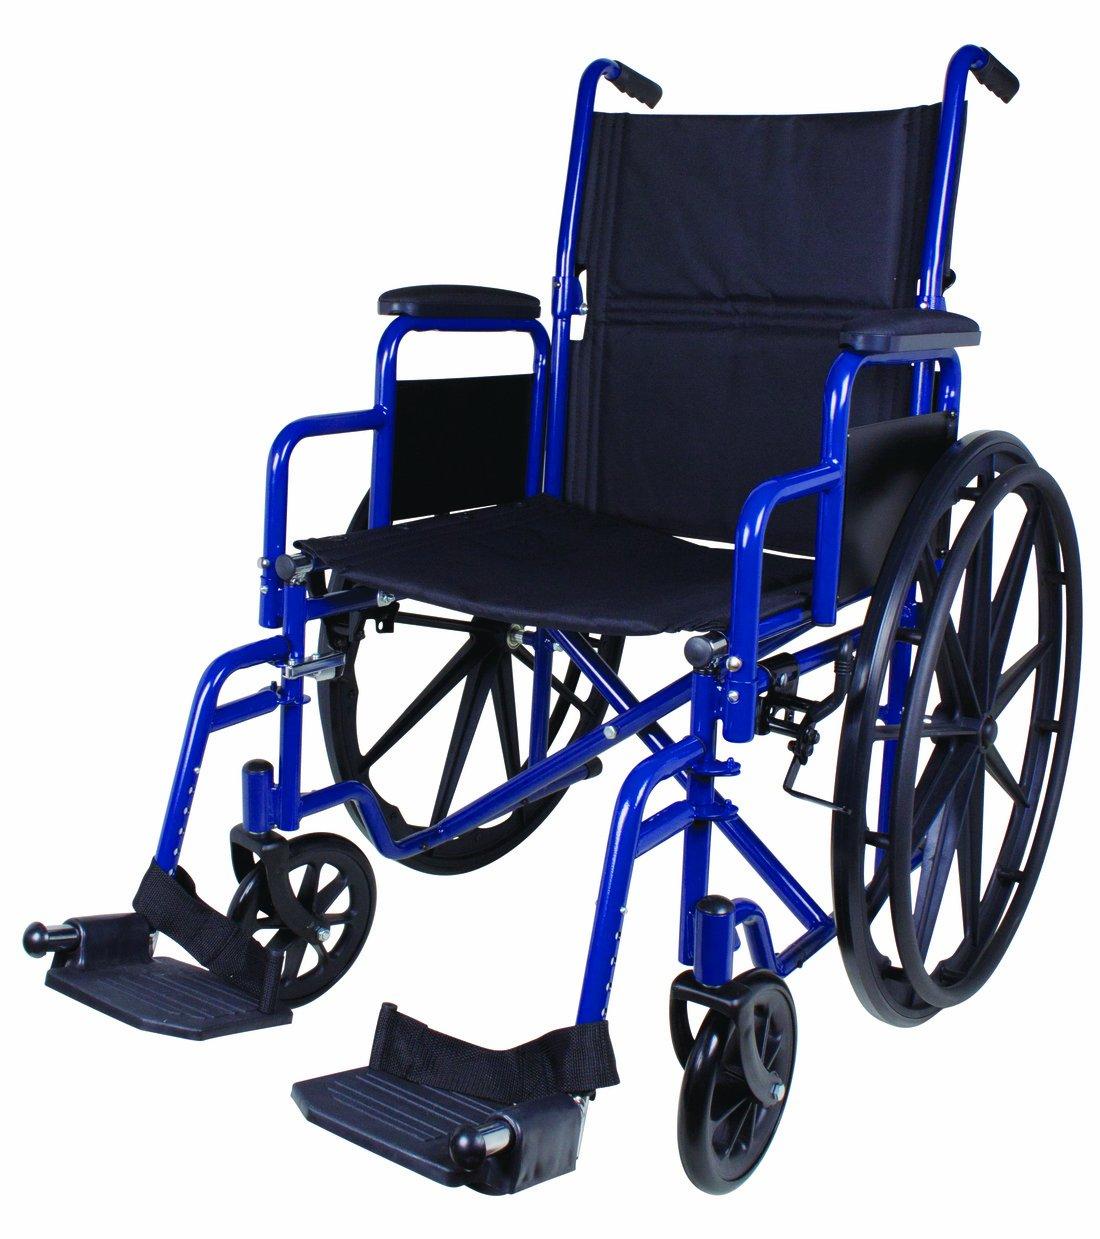 Carex Health Brands Wheelchair, Blue